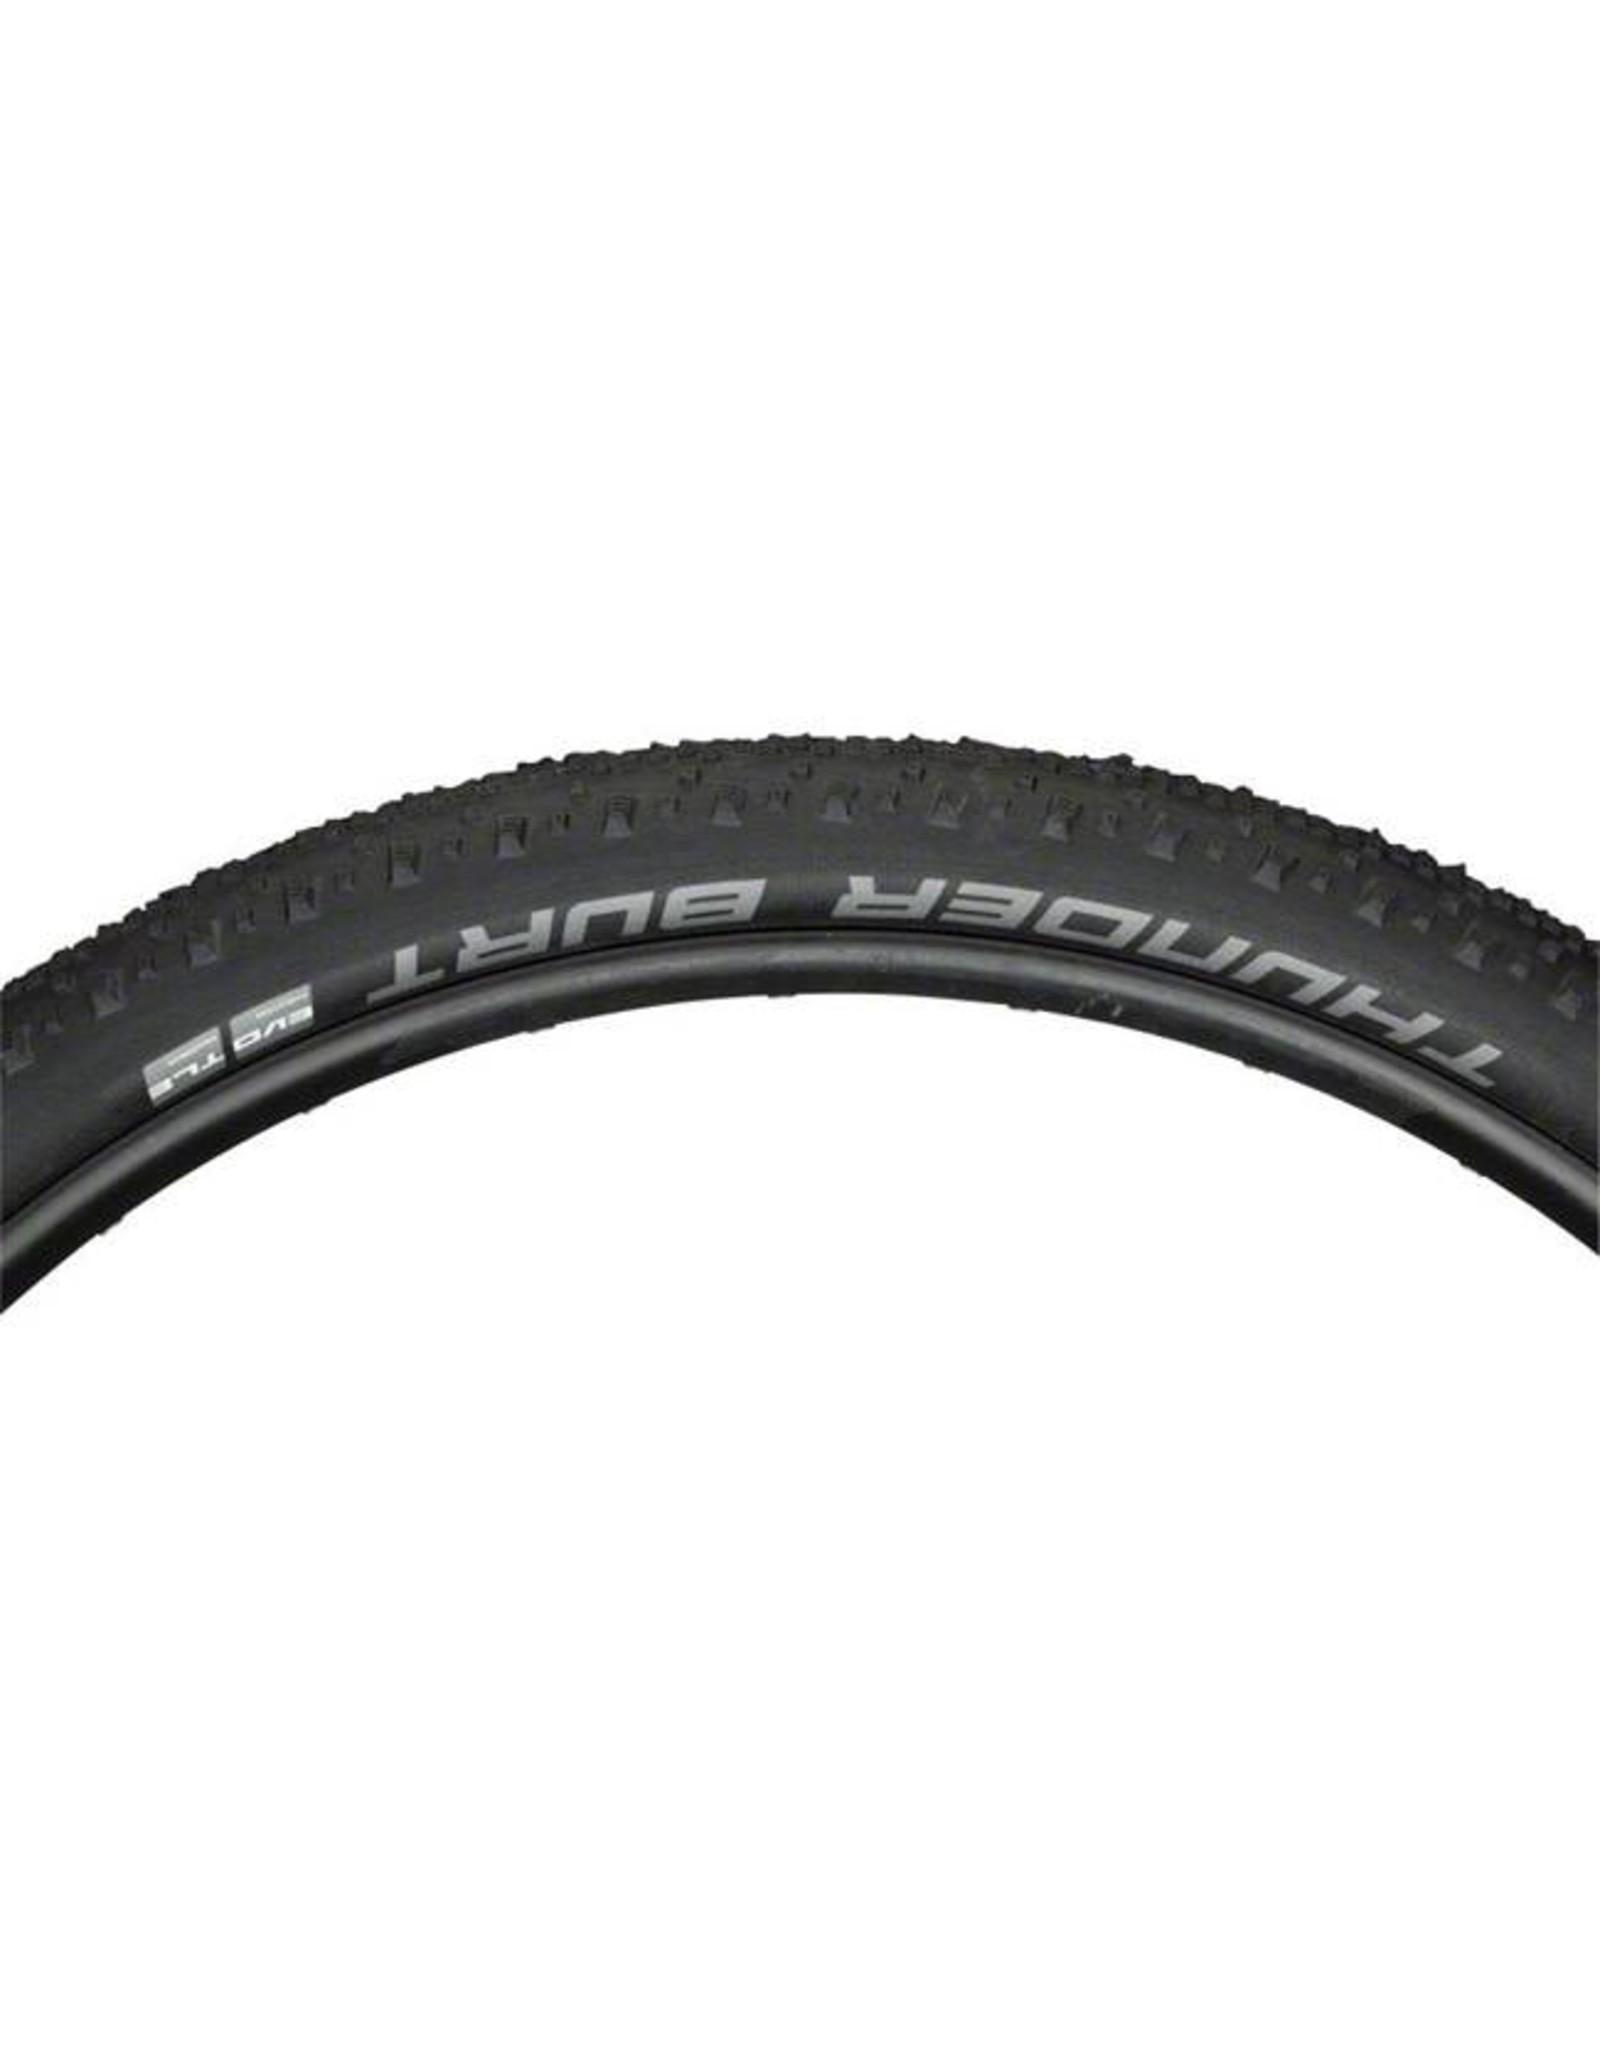 "Schwalbe Schwalbe Thunder Burt Tire: 29 x 2.10"", Folding Bead, Evolution Line, Addix Speed Compound, SnakeSkin, Tubeless Easy, Black"